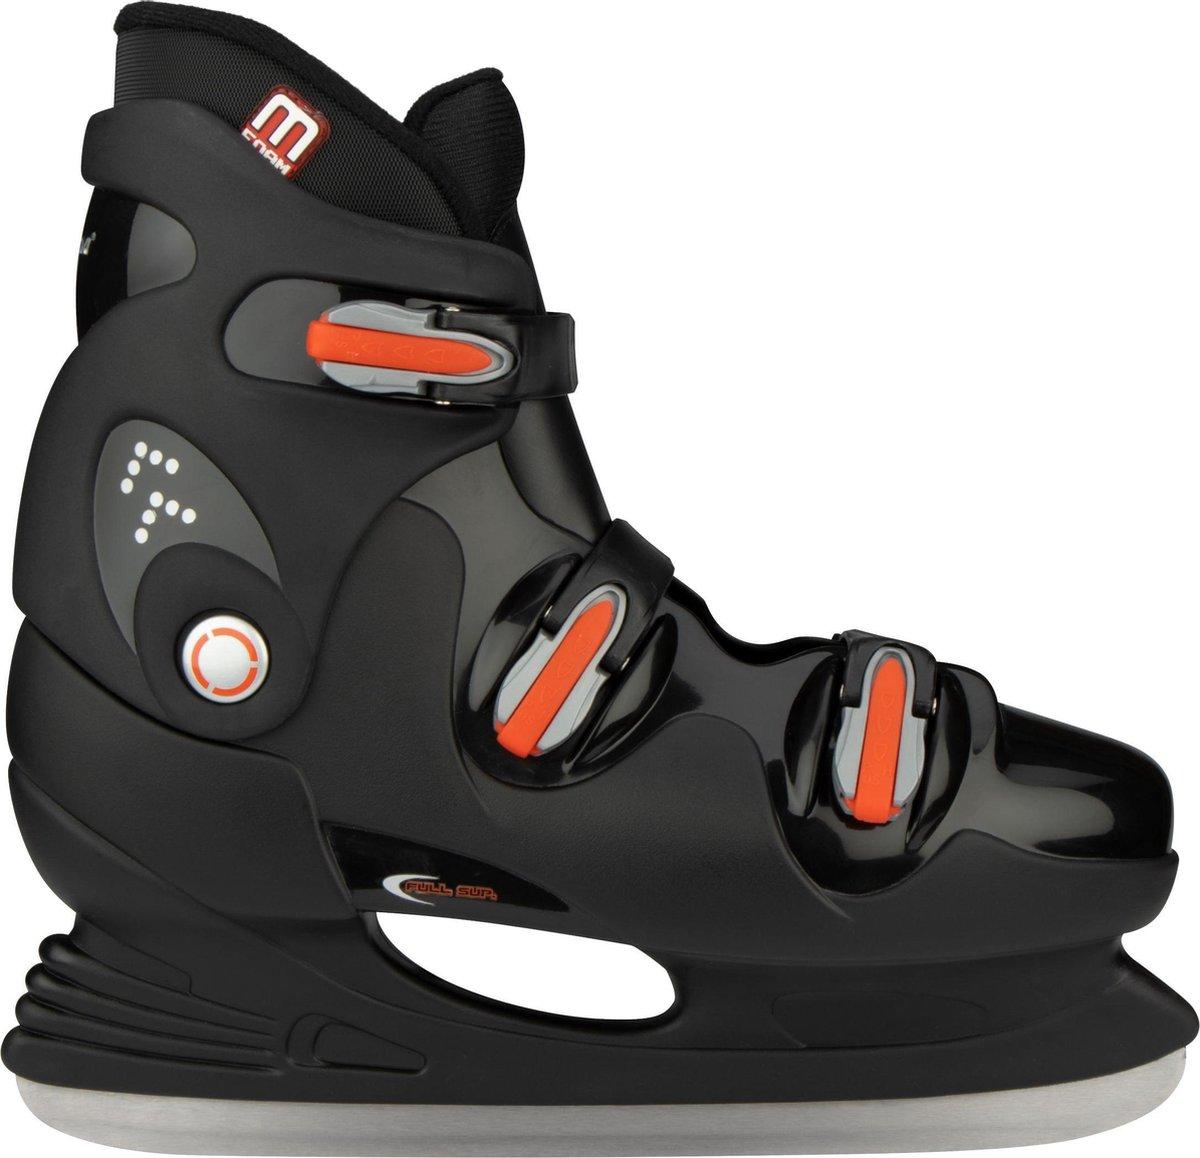 Nijdam IJshockeyschaats - Hardboot - Zwart/Zilver/Rood - 45